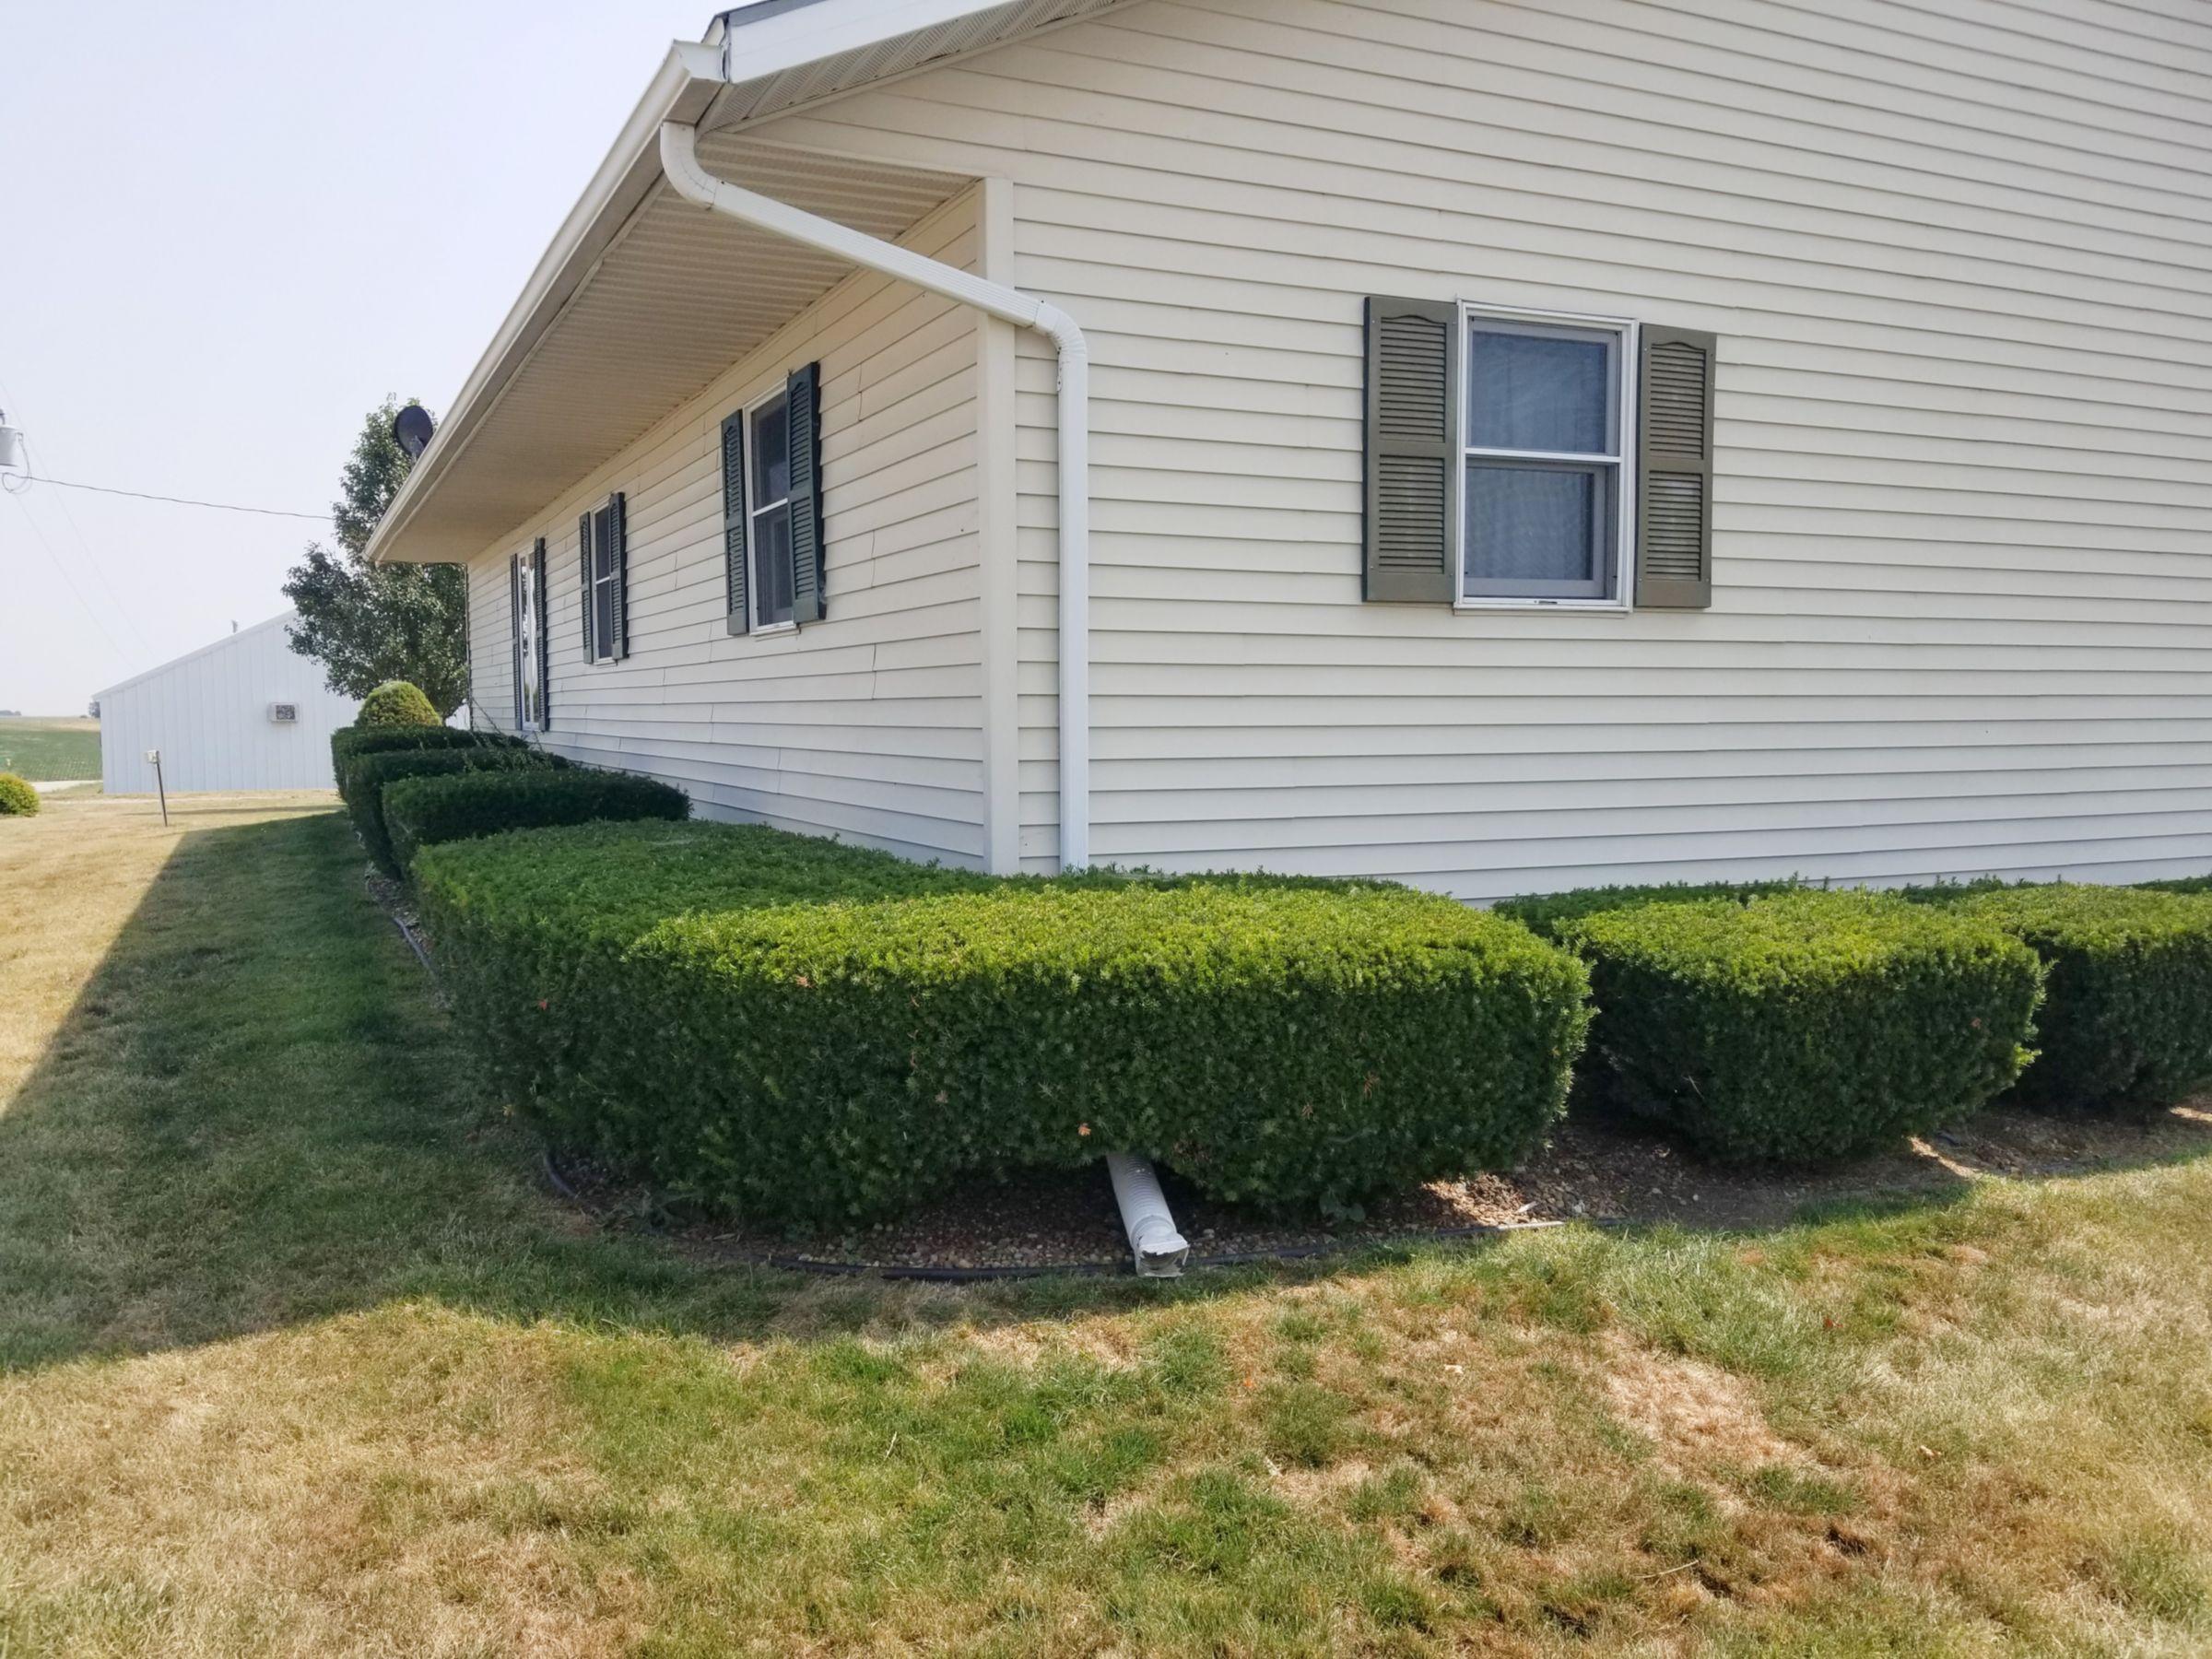 residential-land-poweshiek-county-iowa-5-acres-listing-number-15149-11-2020-08-28-201009.jpg